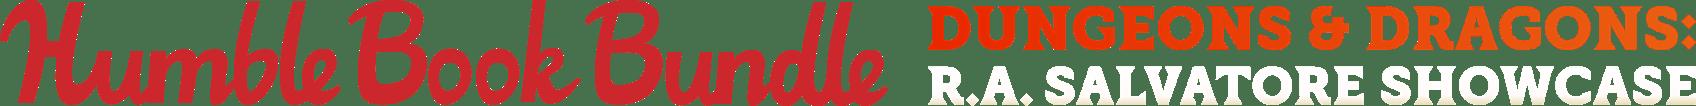 Humble Book Bundle: Dungeons & Dragons: R.A. Salvatore Showcase